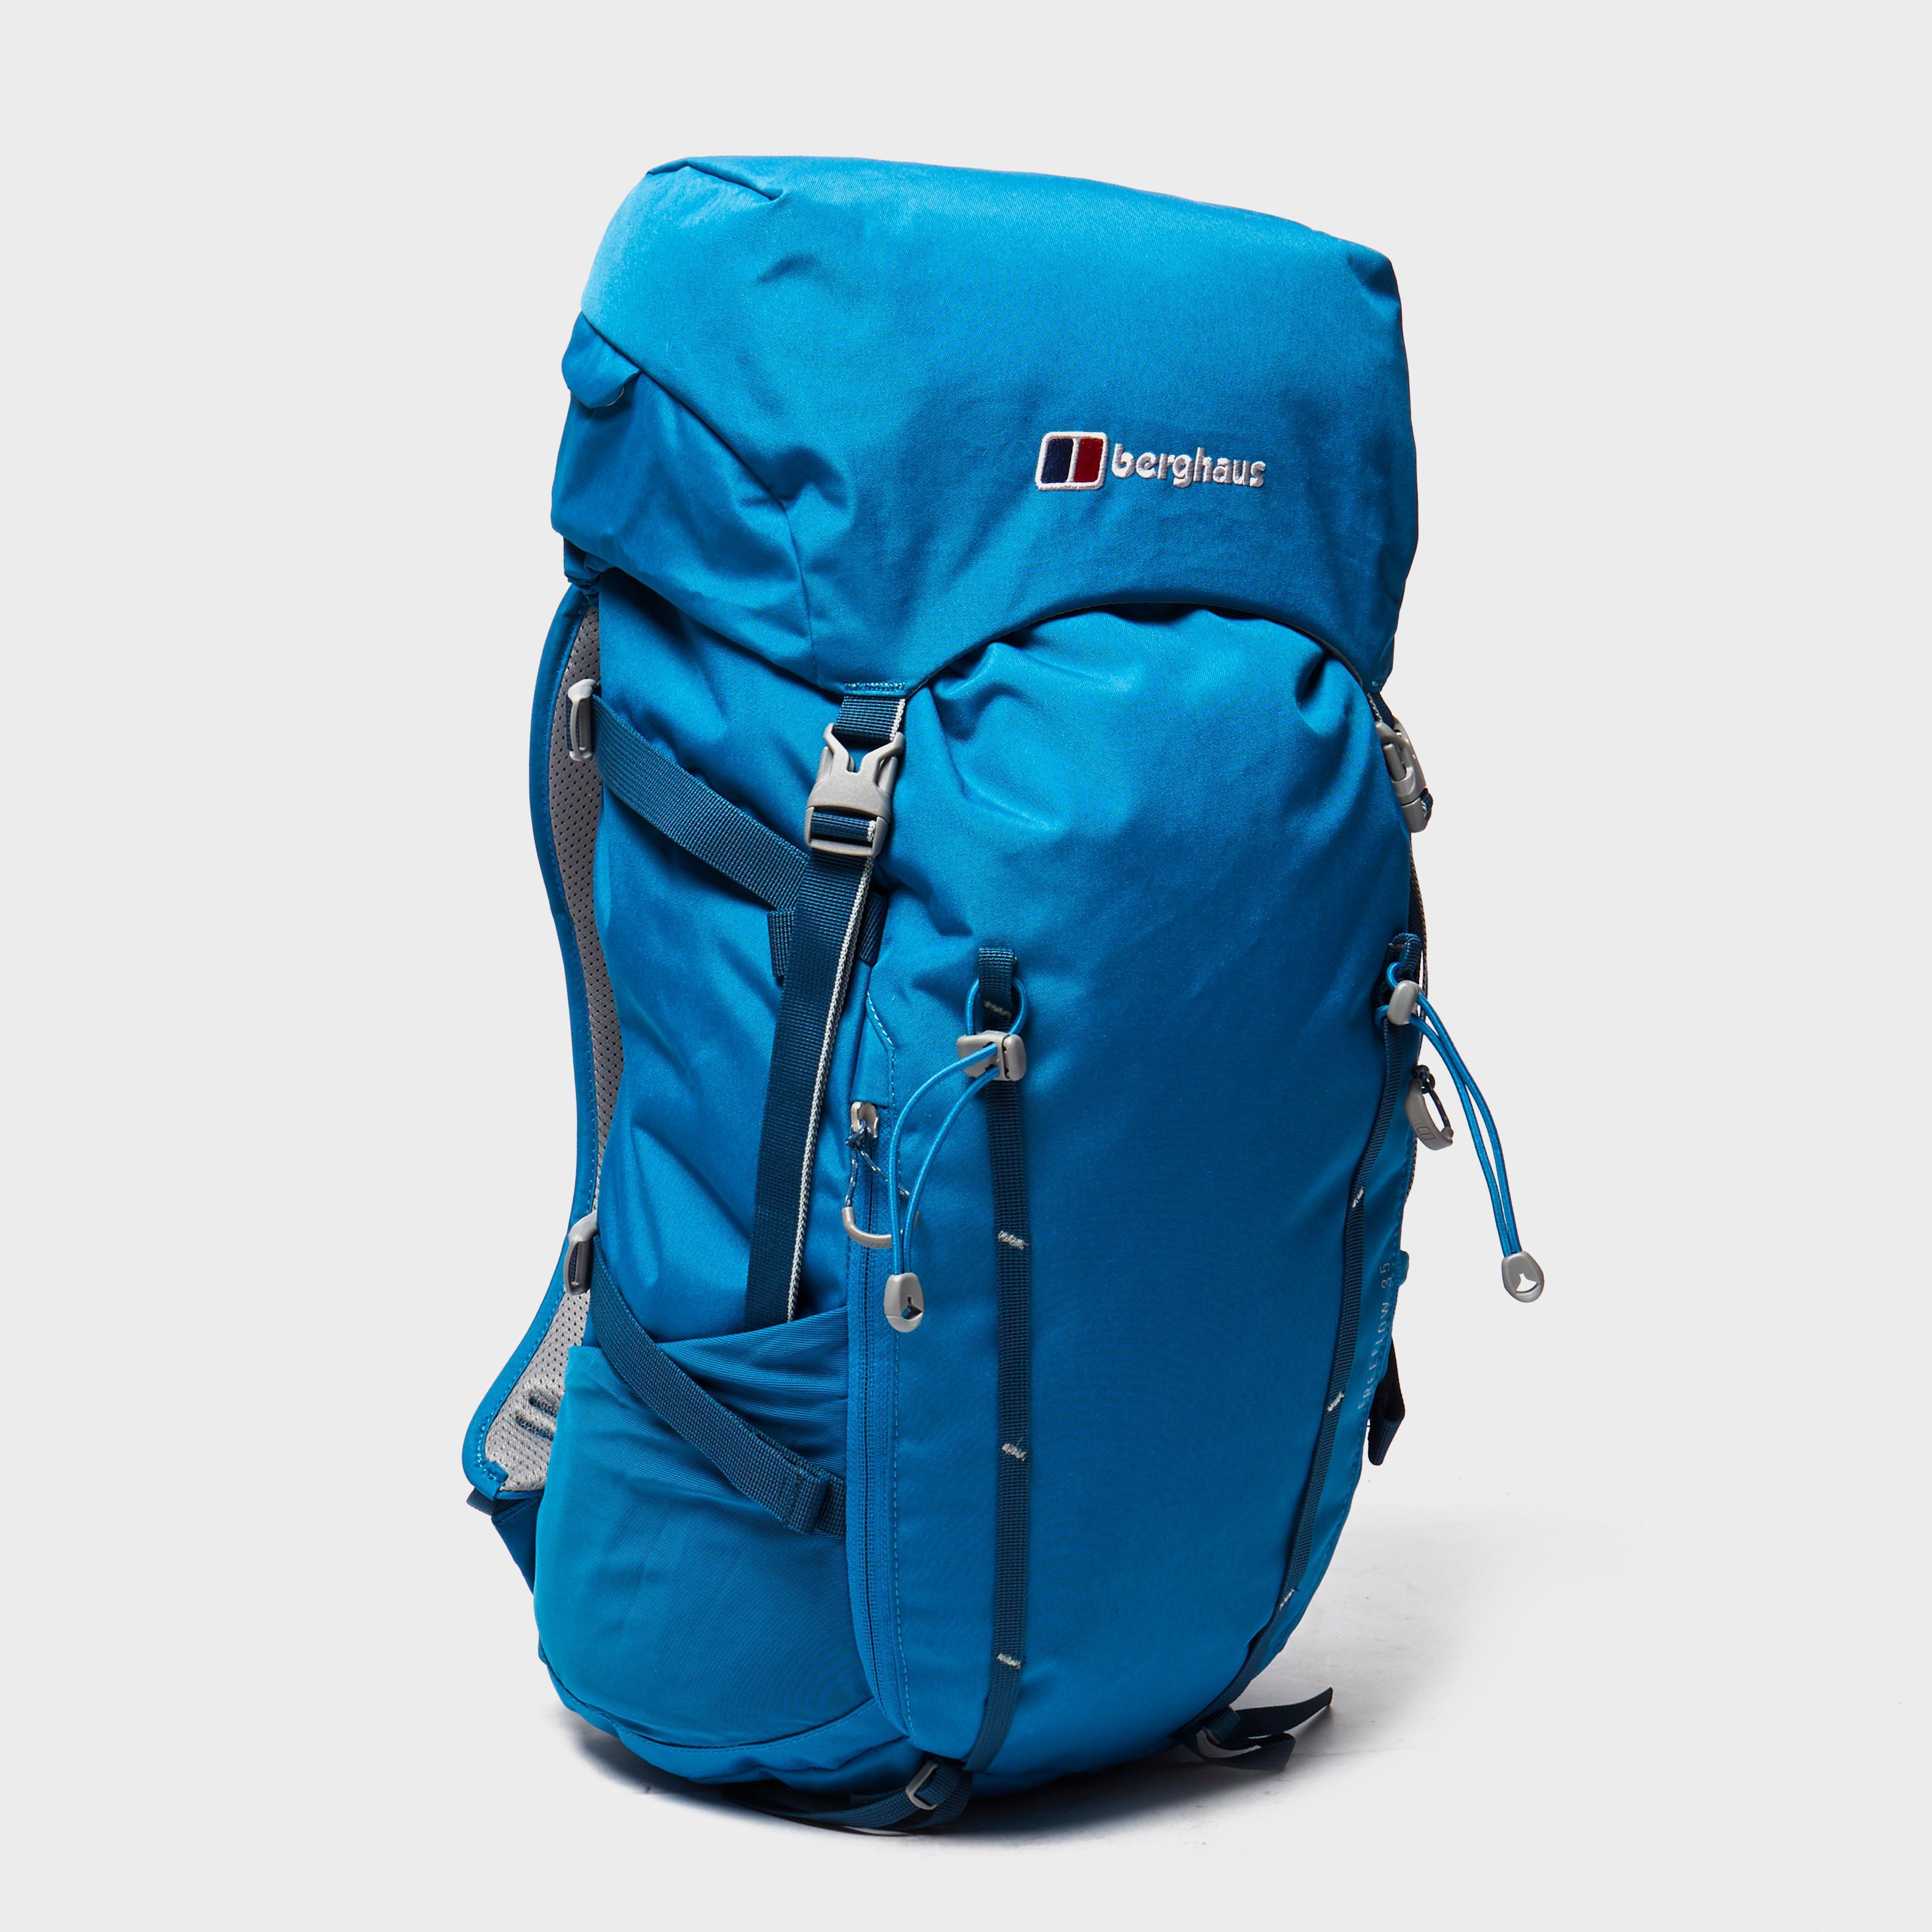 Berghaus Freeflow 35 Litre Backpack 2749ba9d0326d